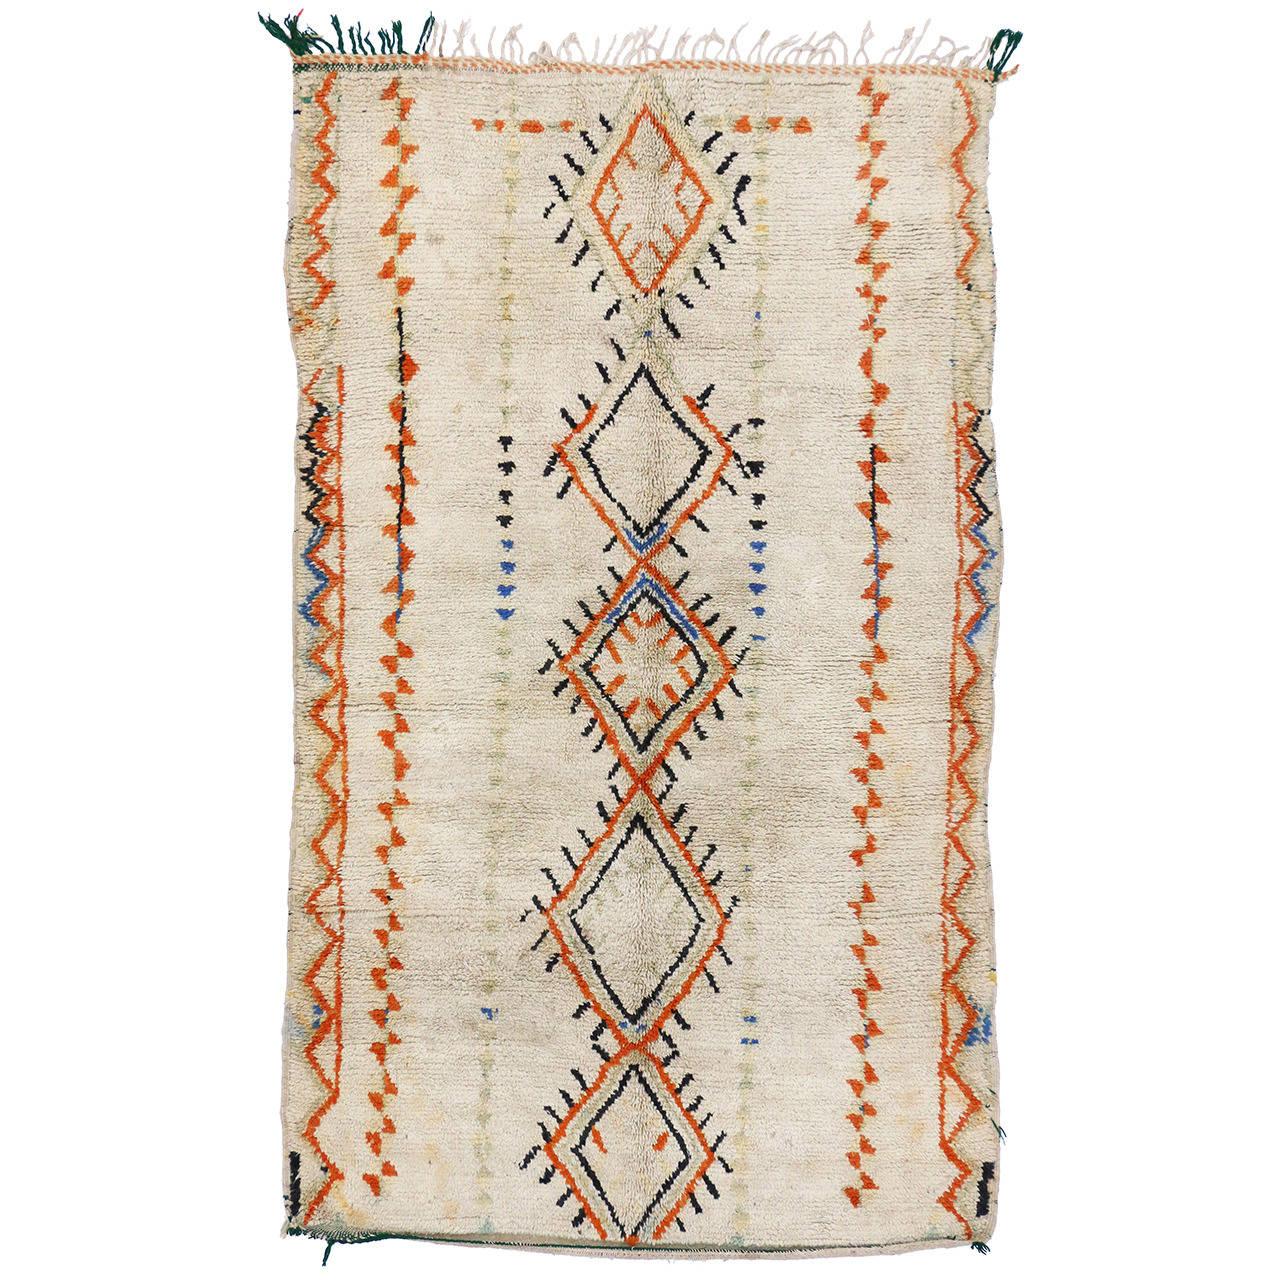 "Vintage Moroccan Area Rug For Sale At 1stdibs: Vintage Berber Moroccan Rug, 04'06"" X 07'06"" At 1stdibs"